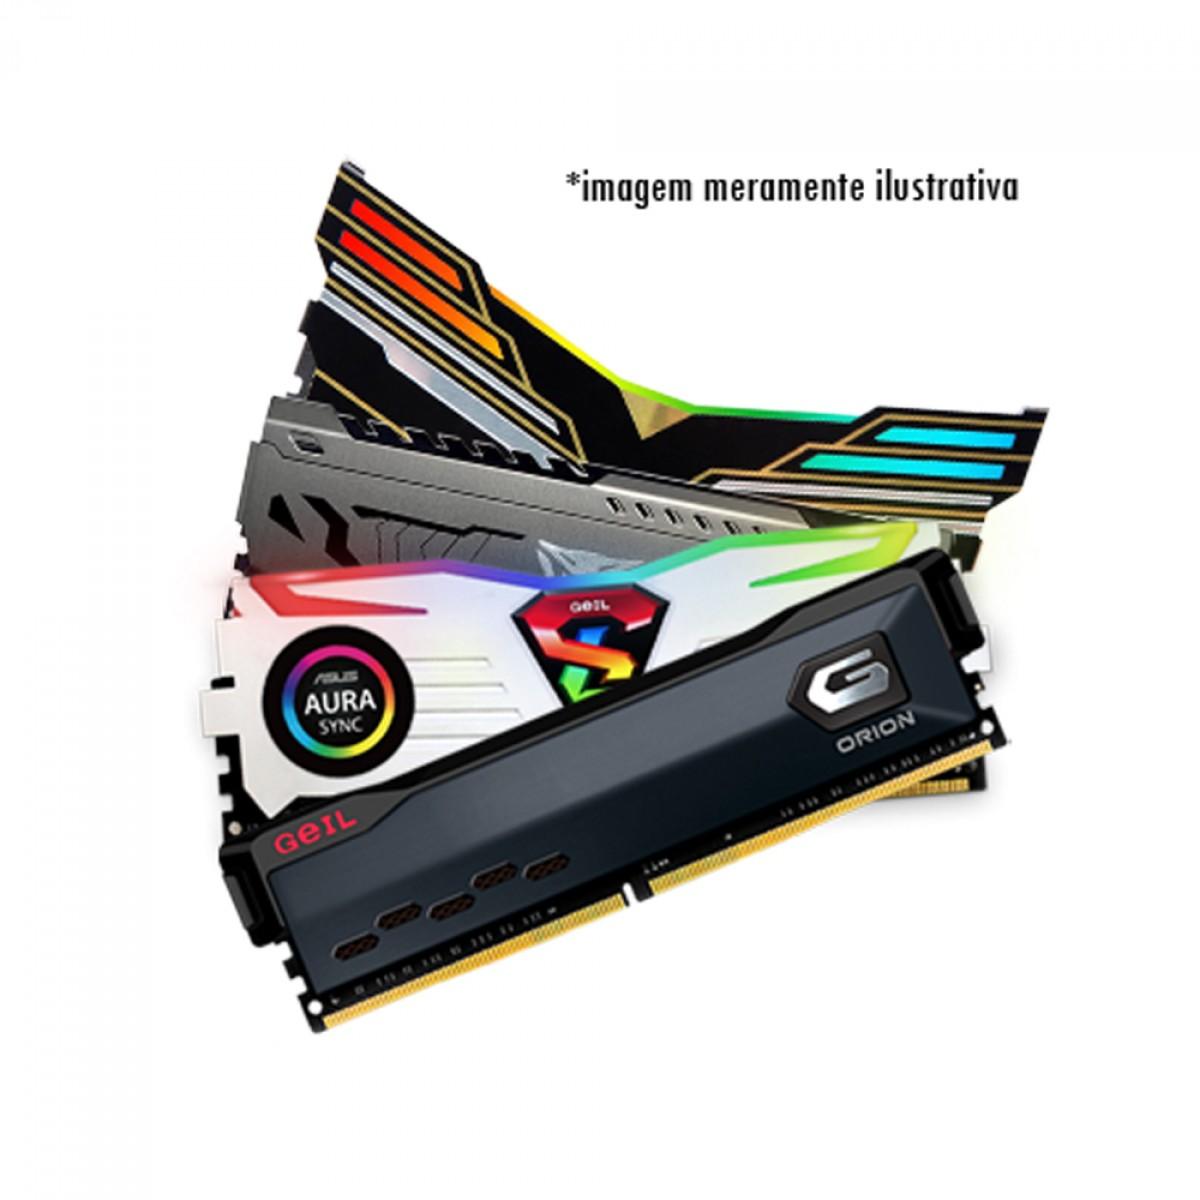 Kit Upgrade, GIGABYTE B450M Gaming + AMD Ryzen 5 PRO 4650G + 16GB DDR4 (2x8GB) 3000MHz